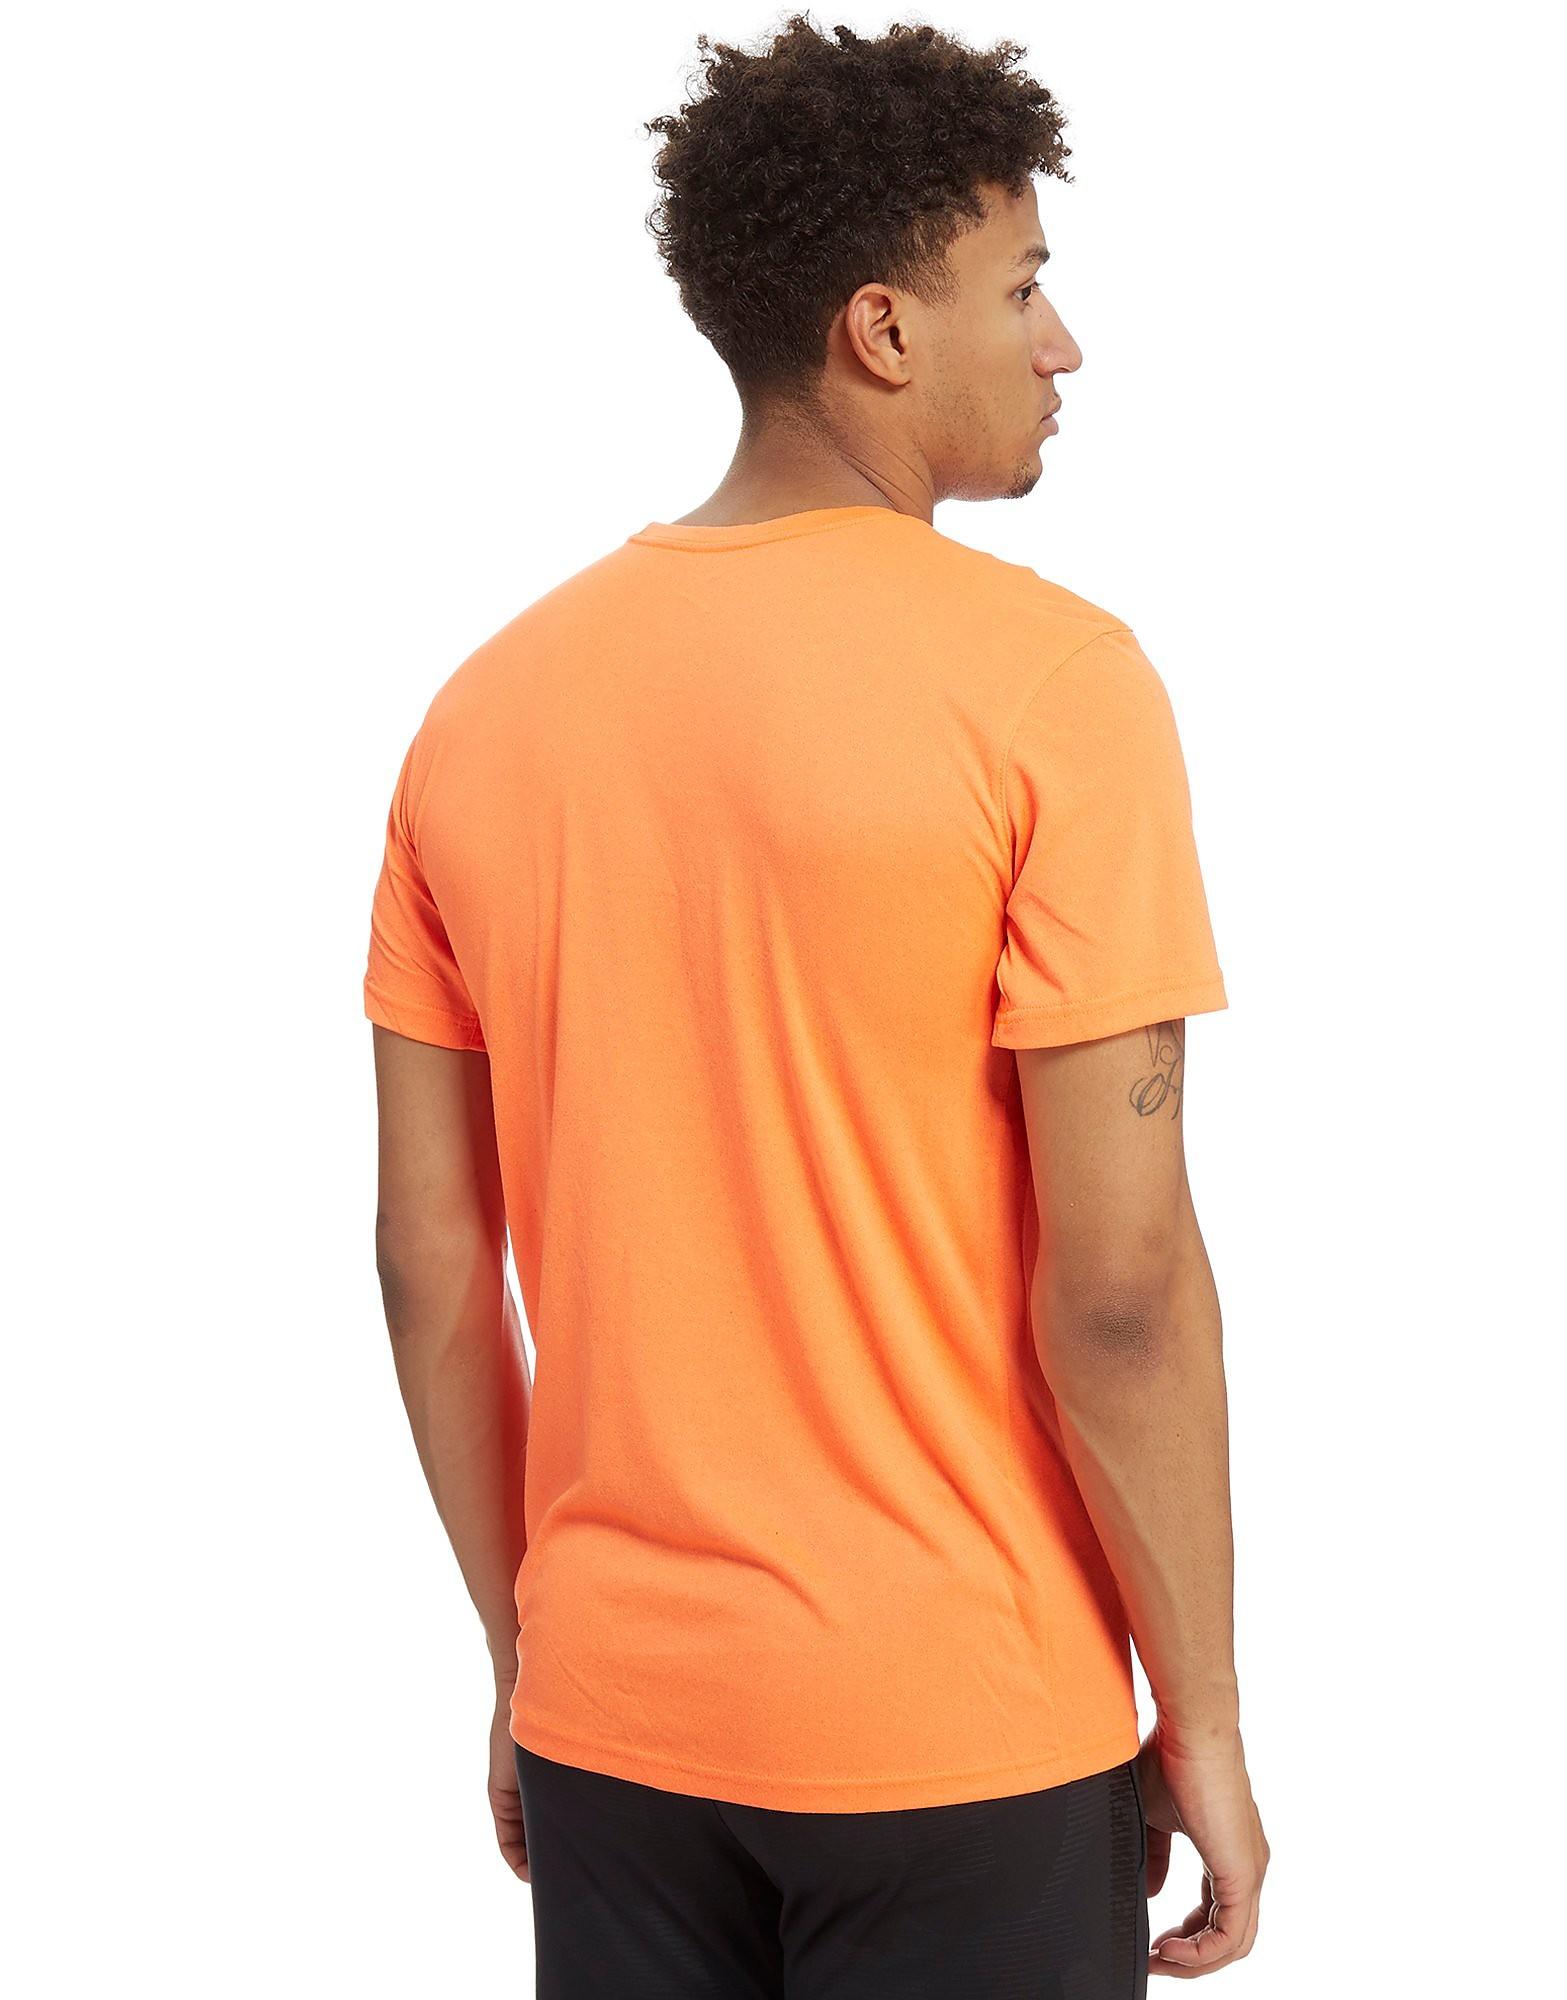 Nike Legend SST T-Shirt